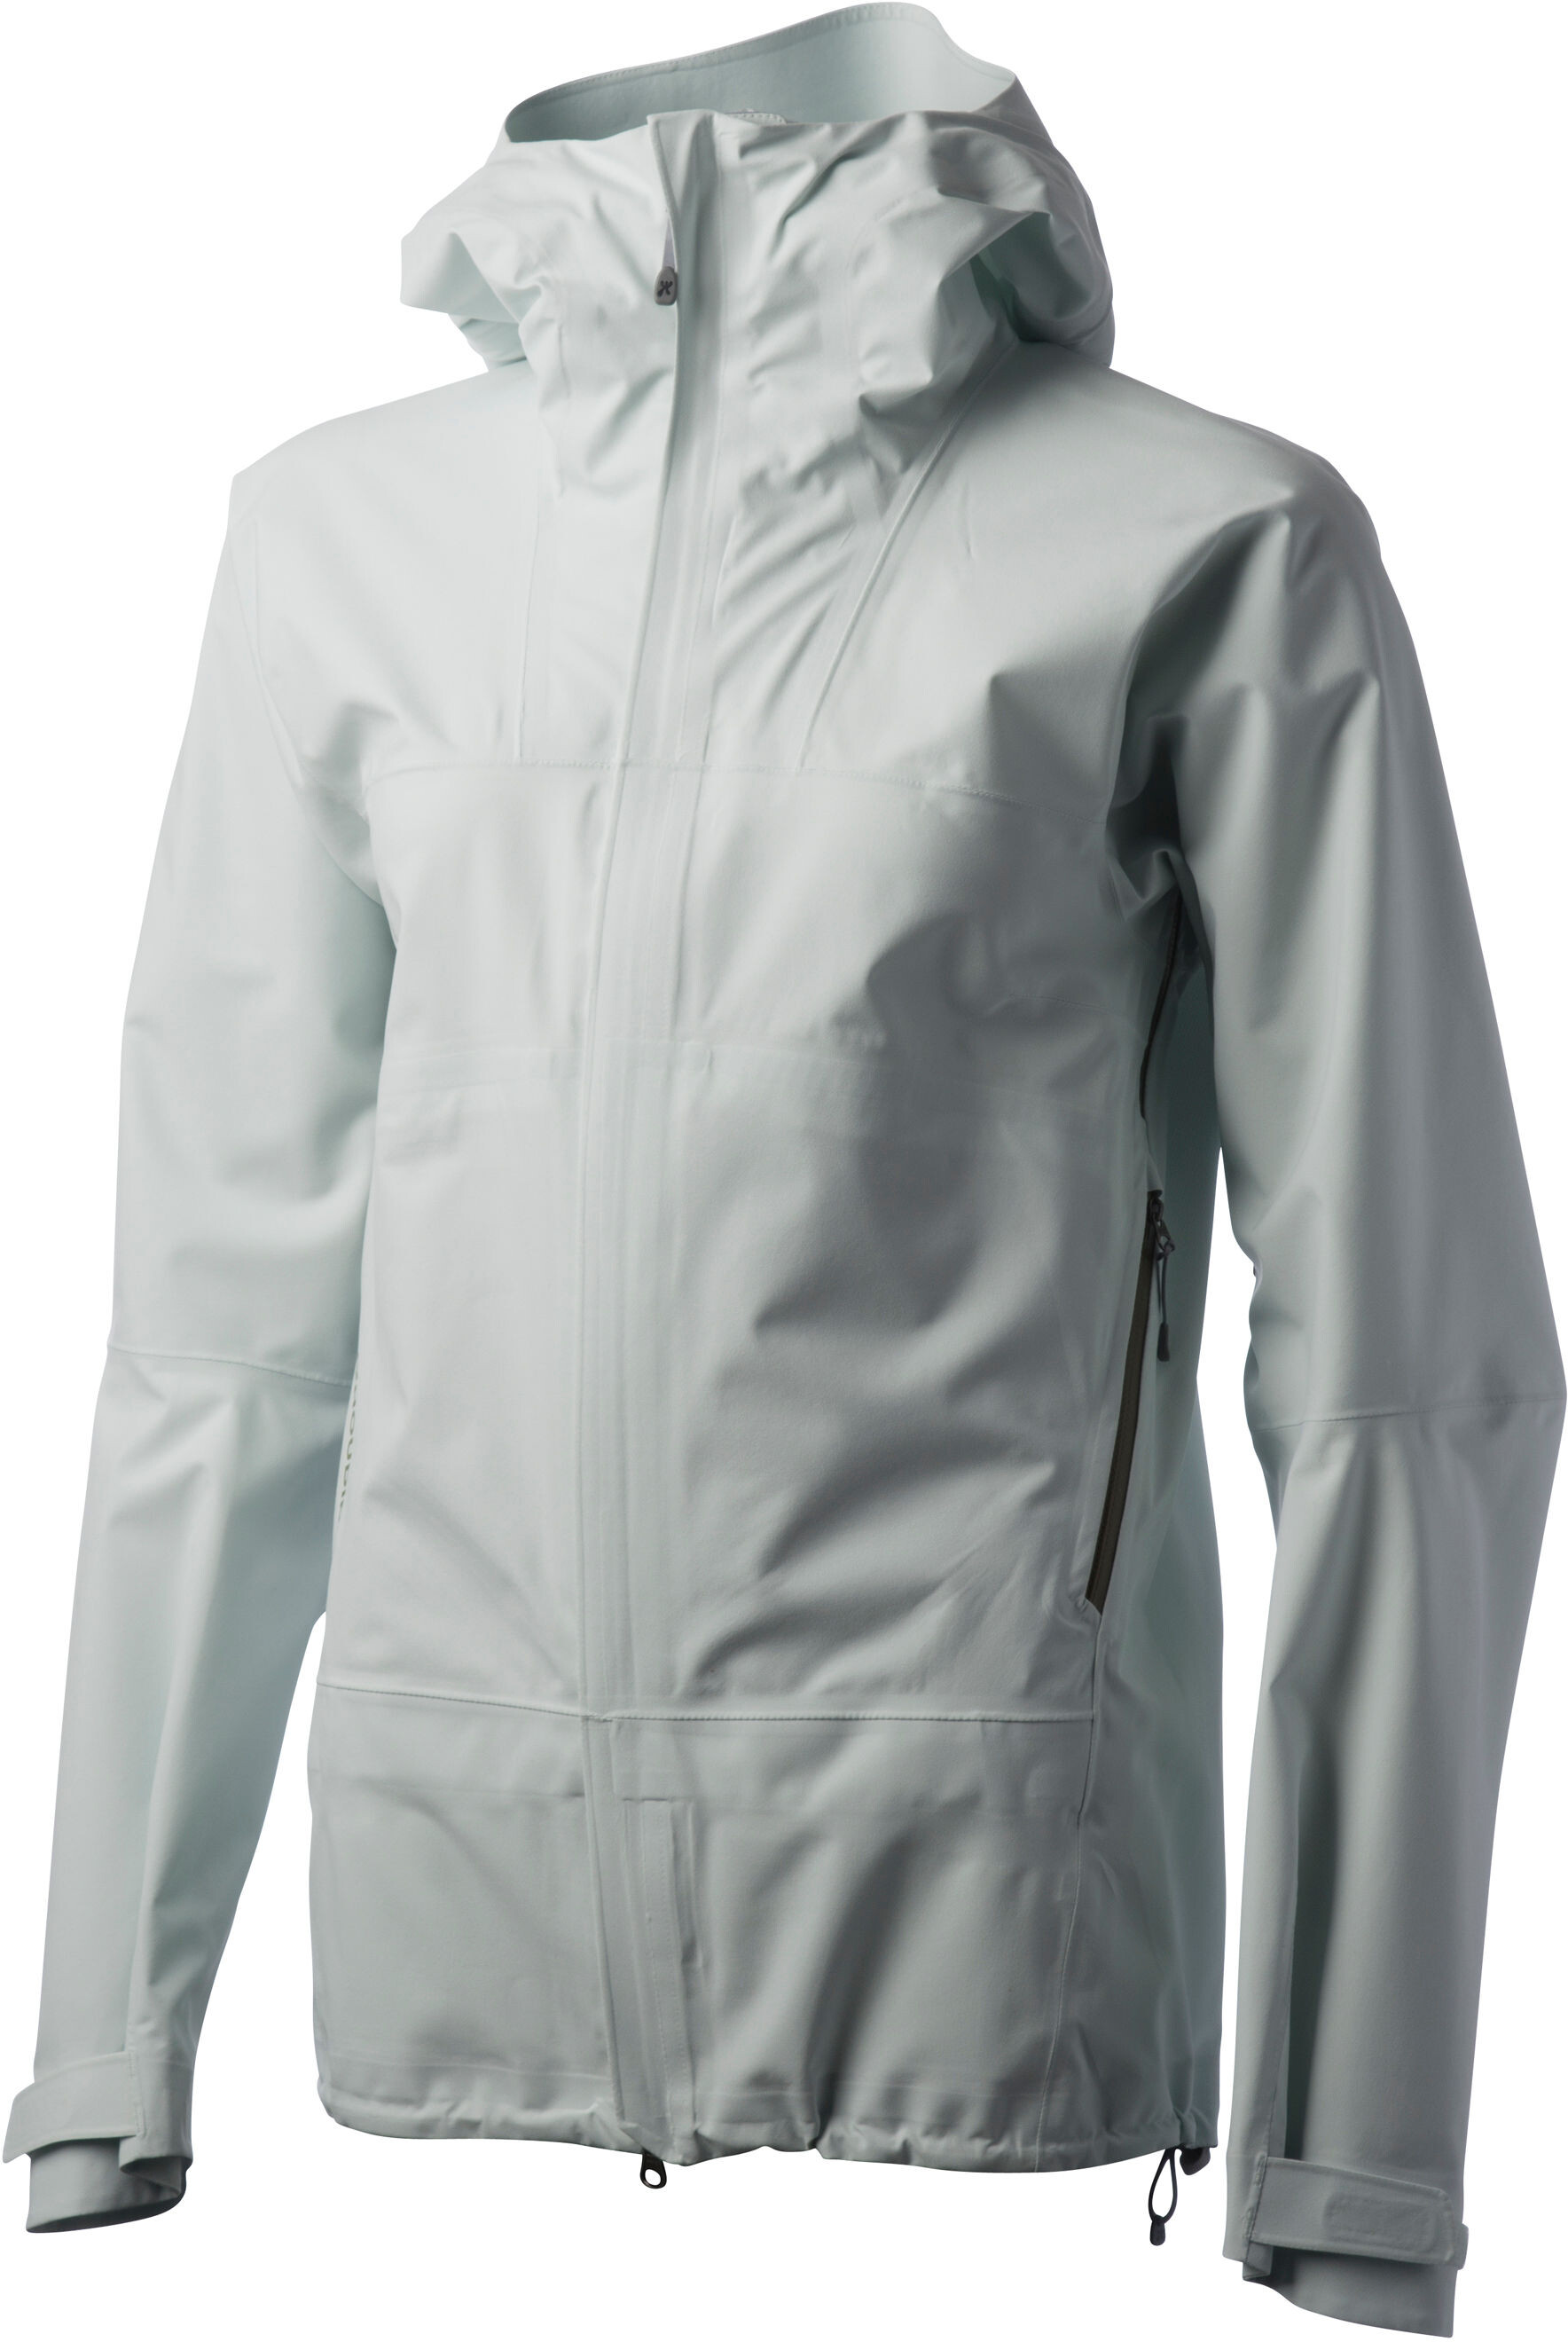 Houdini W s BFF Jacket Cross Step Green - addnature.com d961c5fee9bf4